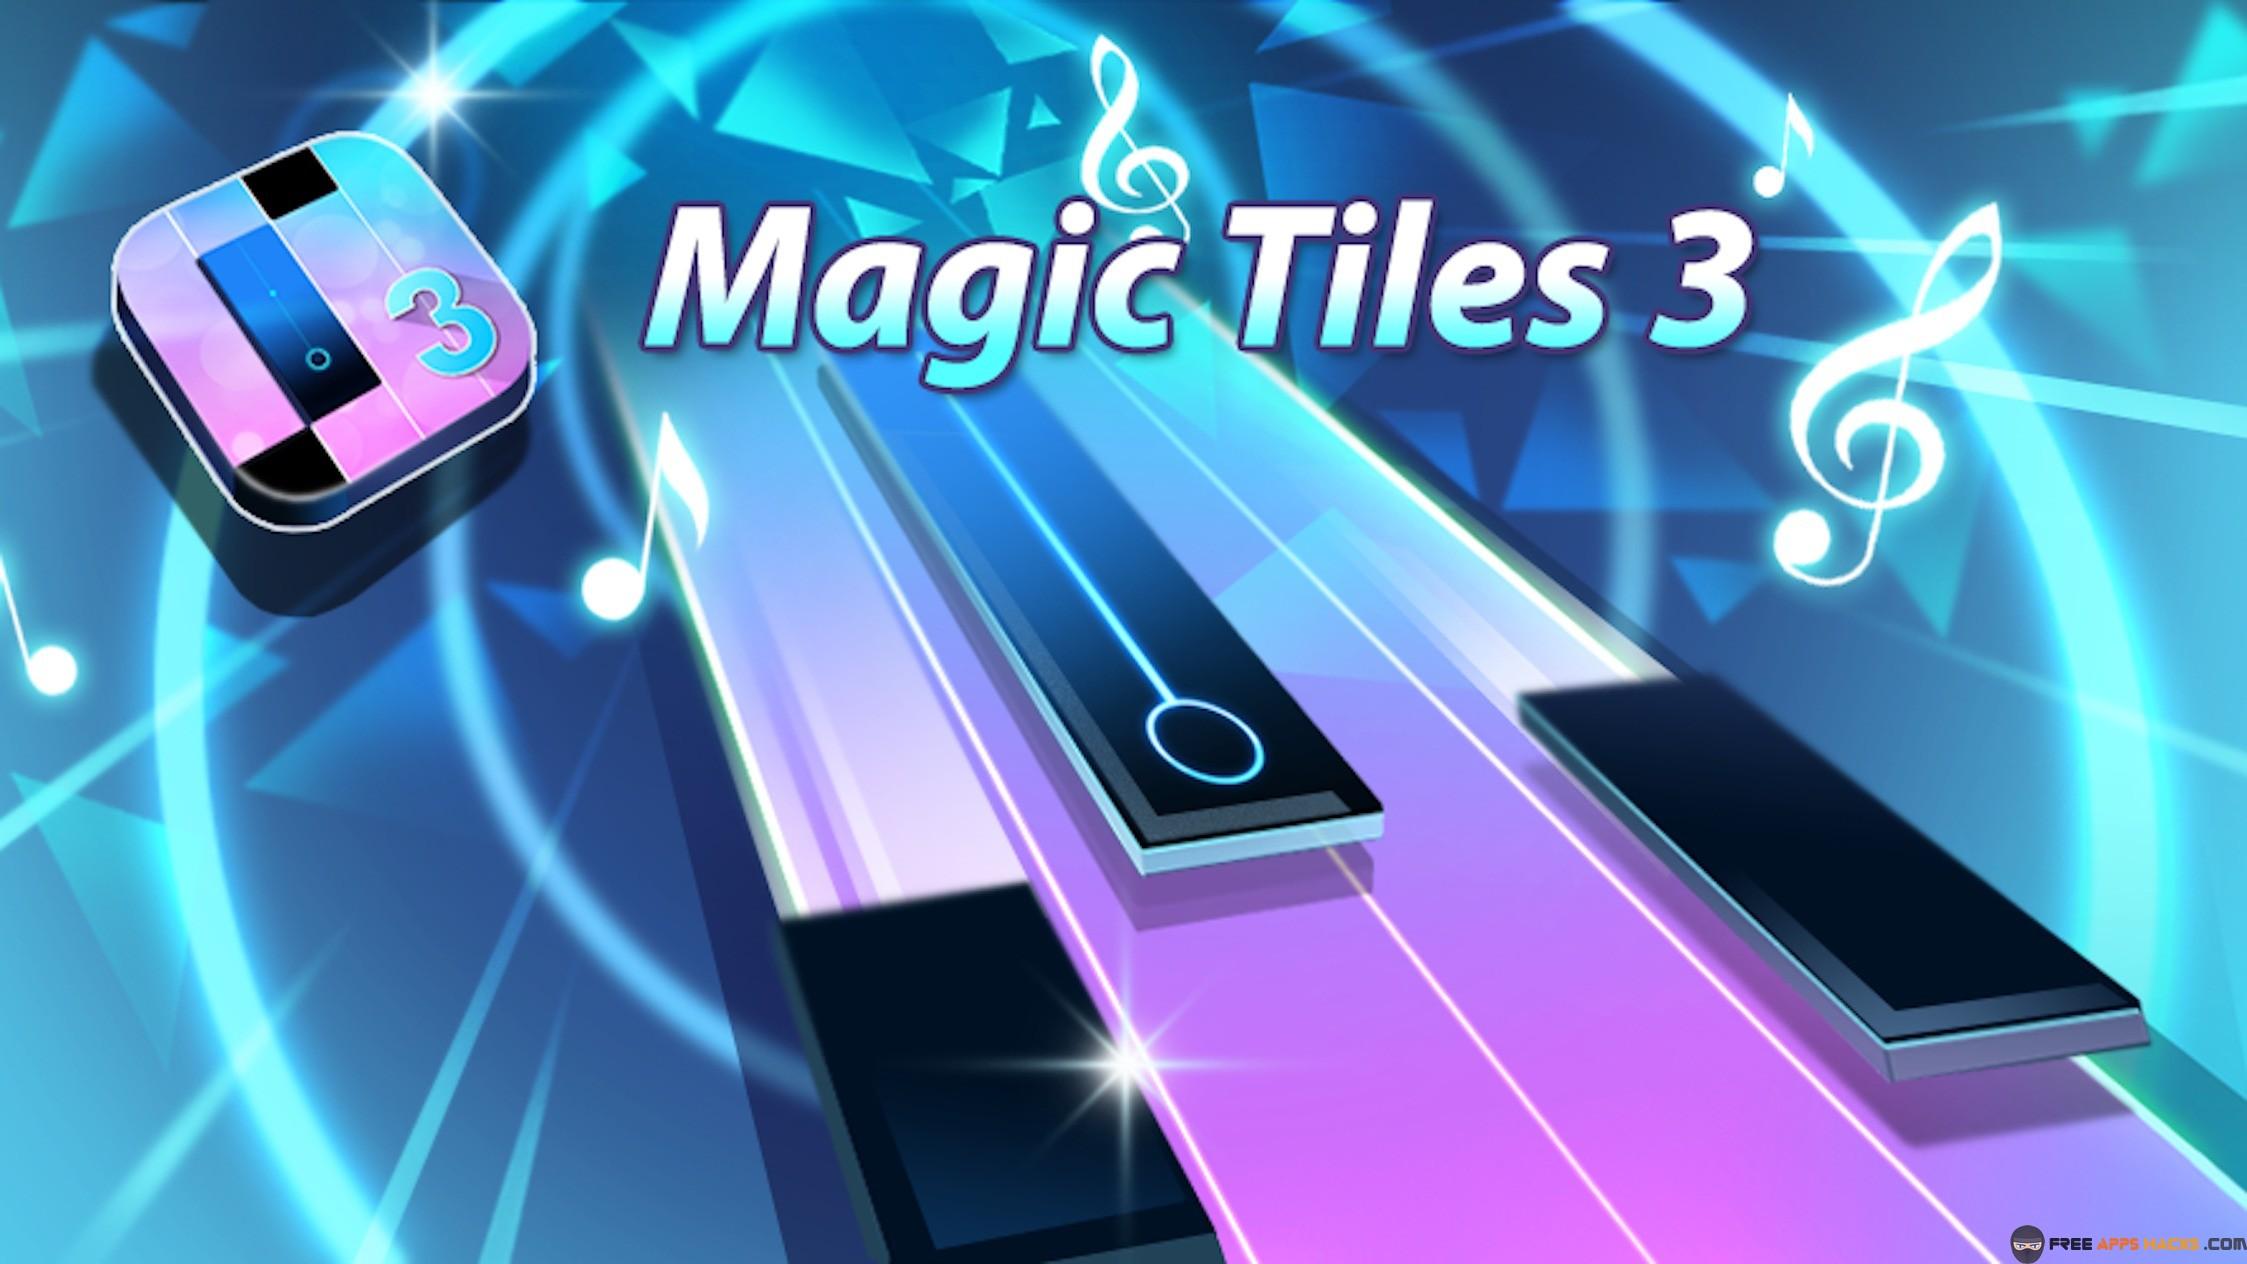 Magic Tiles 3 Modded APK Unlimited Money Android App - Free App Hacks